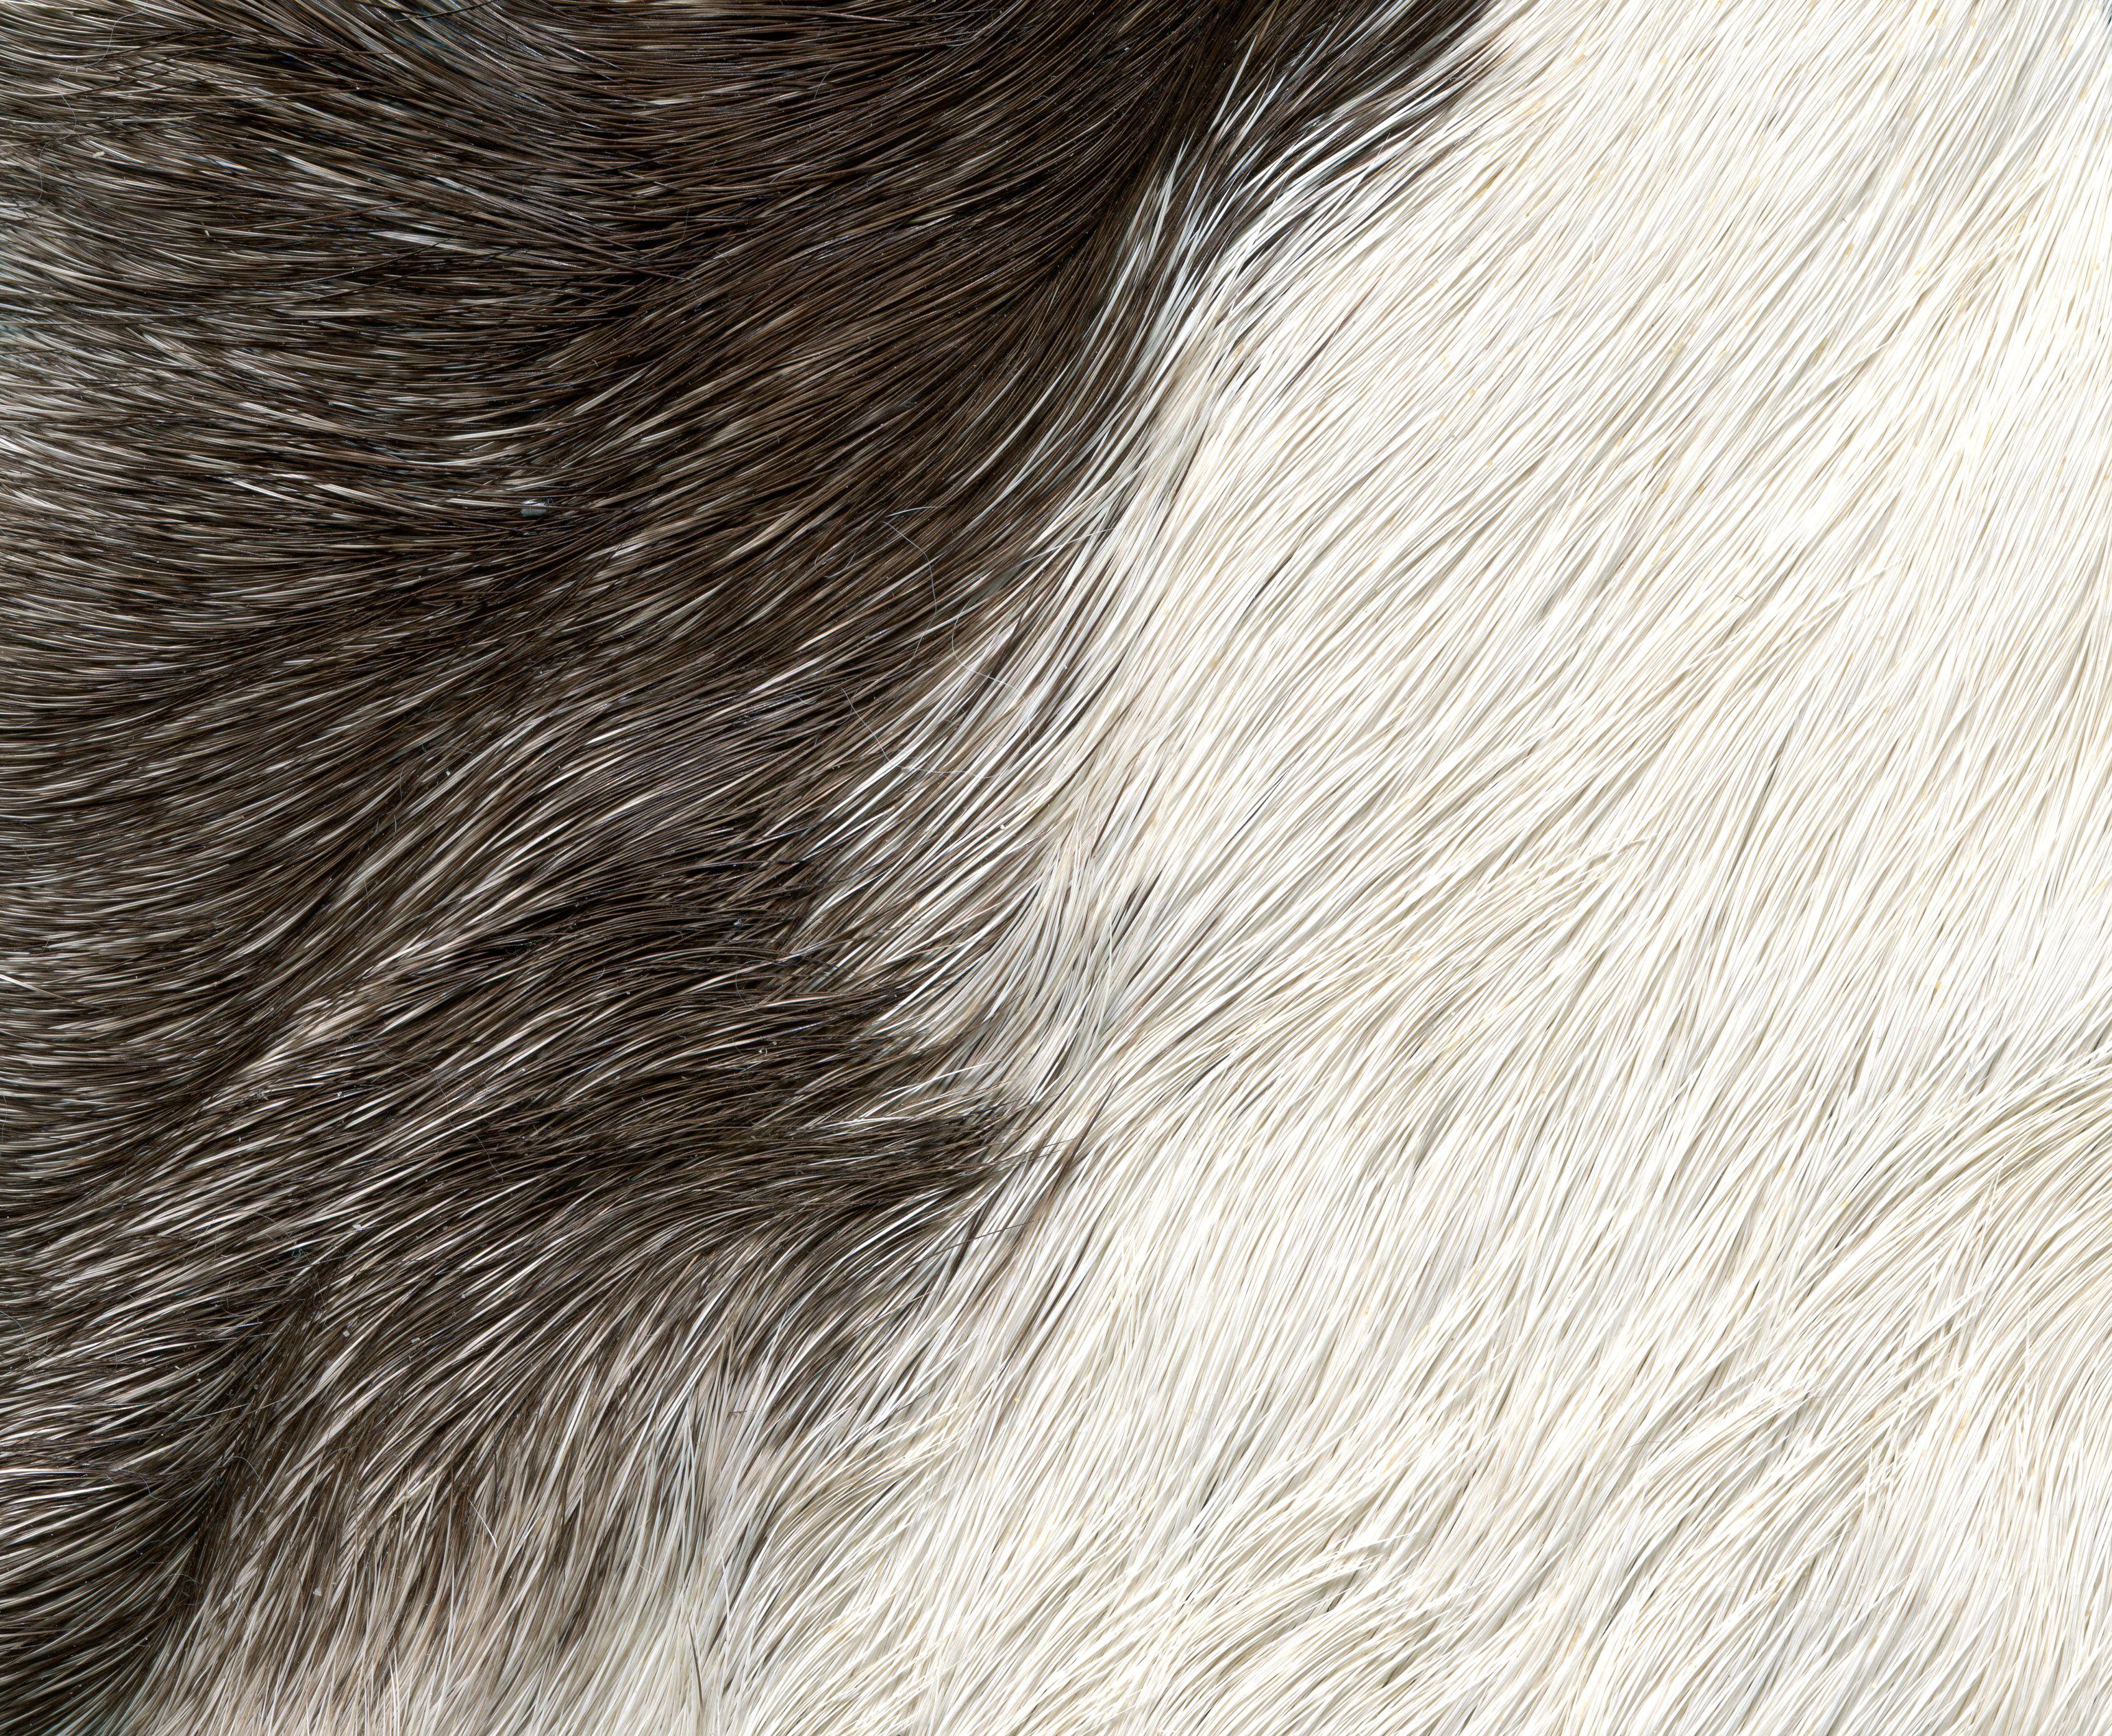 Fur Texture Freebies